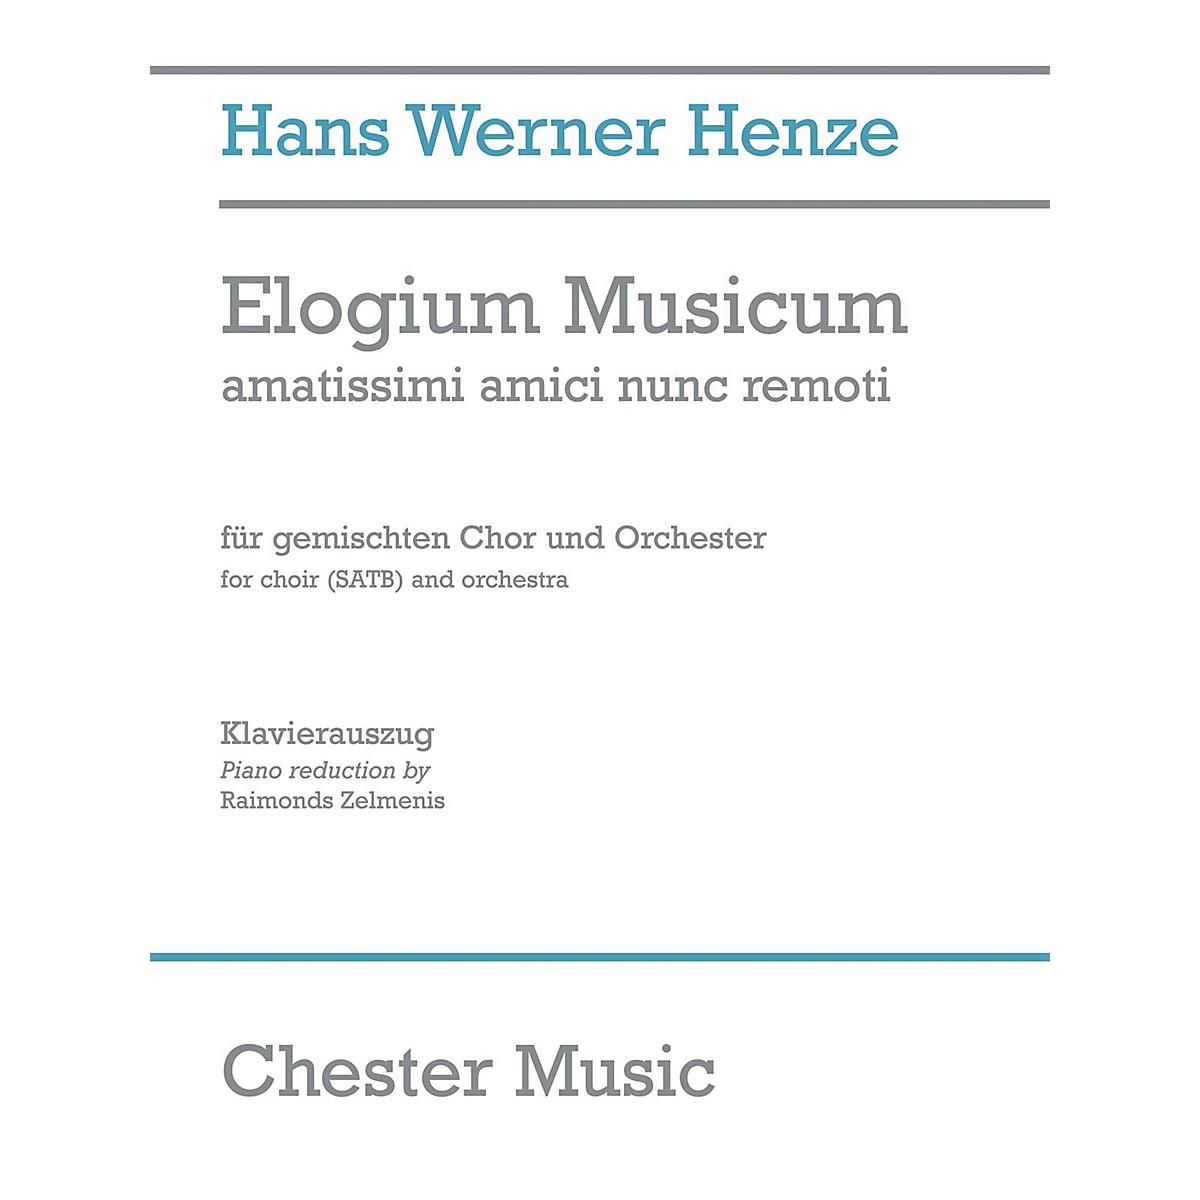 Chester Music Elogium Musicum (amatissimi amici nunc remoti SATB Choir and Orchestra) Vocal Score by Hans Werner Henze